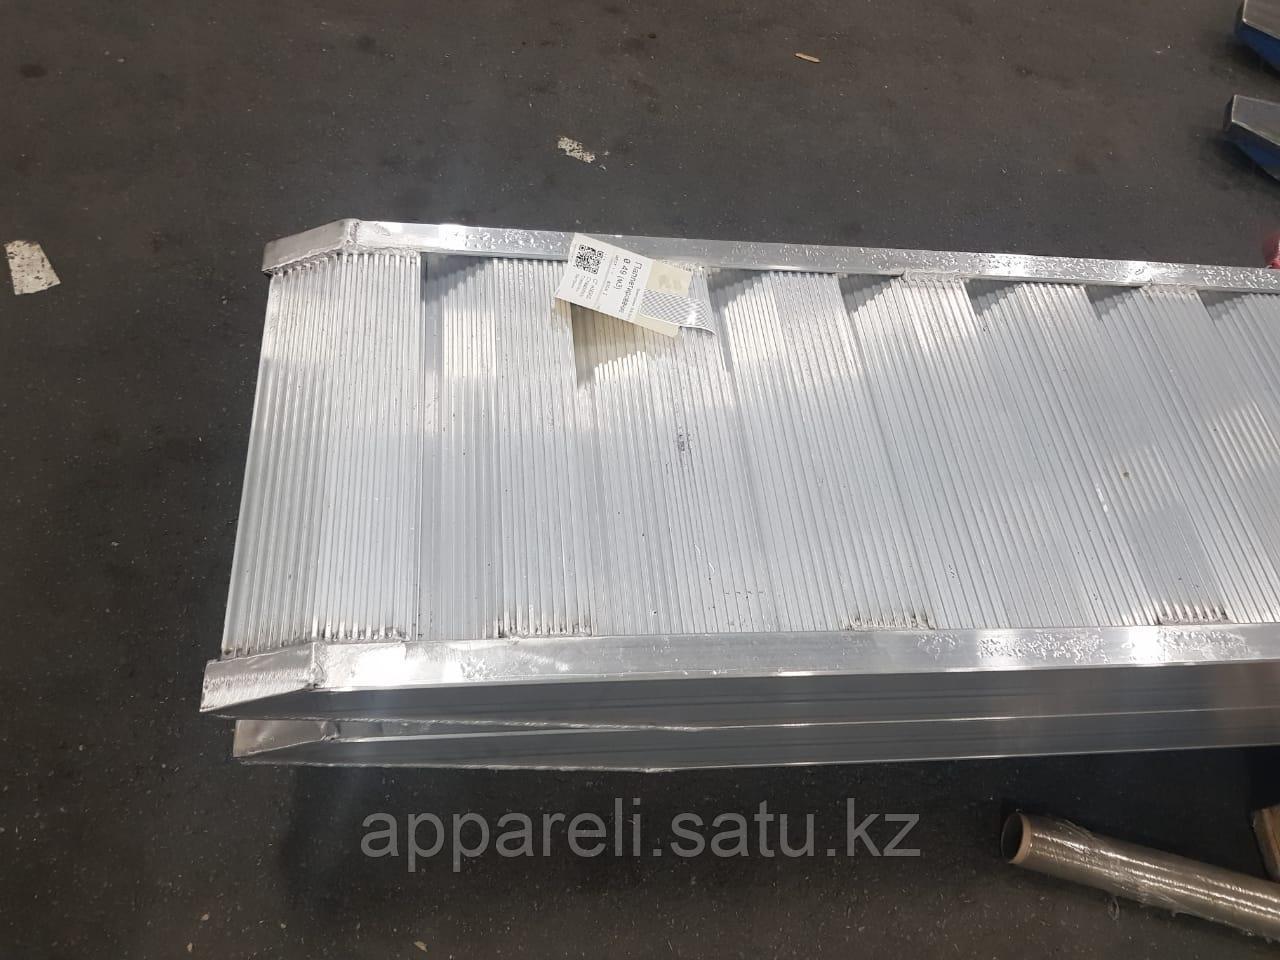 Производство трапов сходней алюминиевых рамп 16-18 тонн